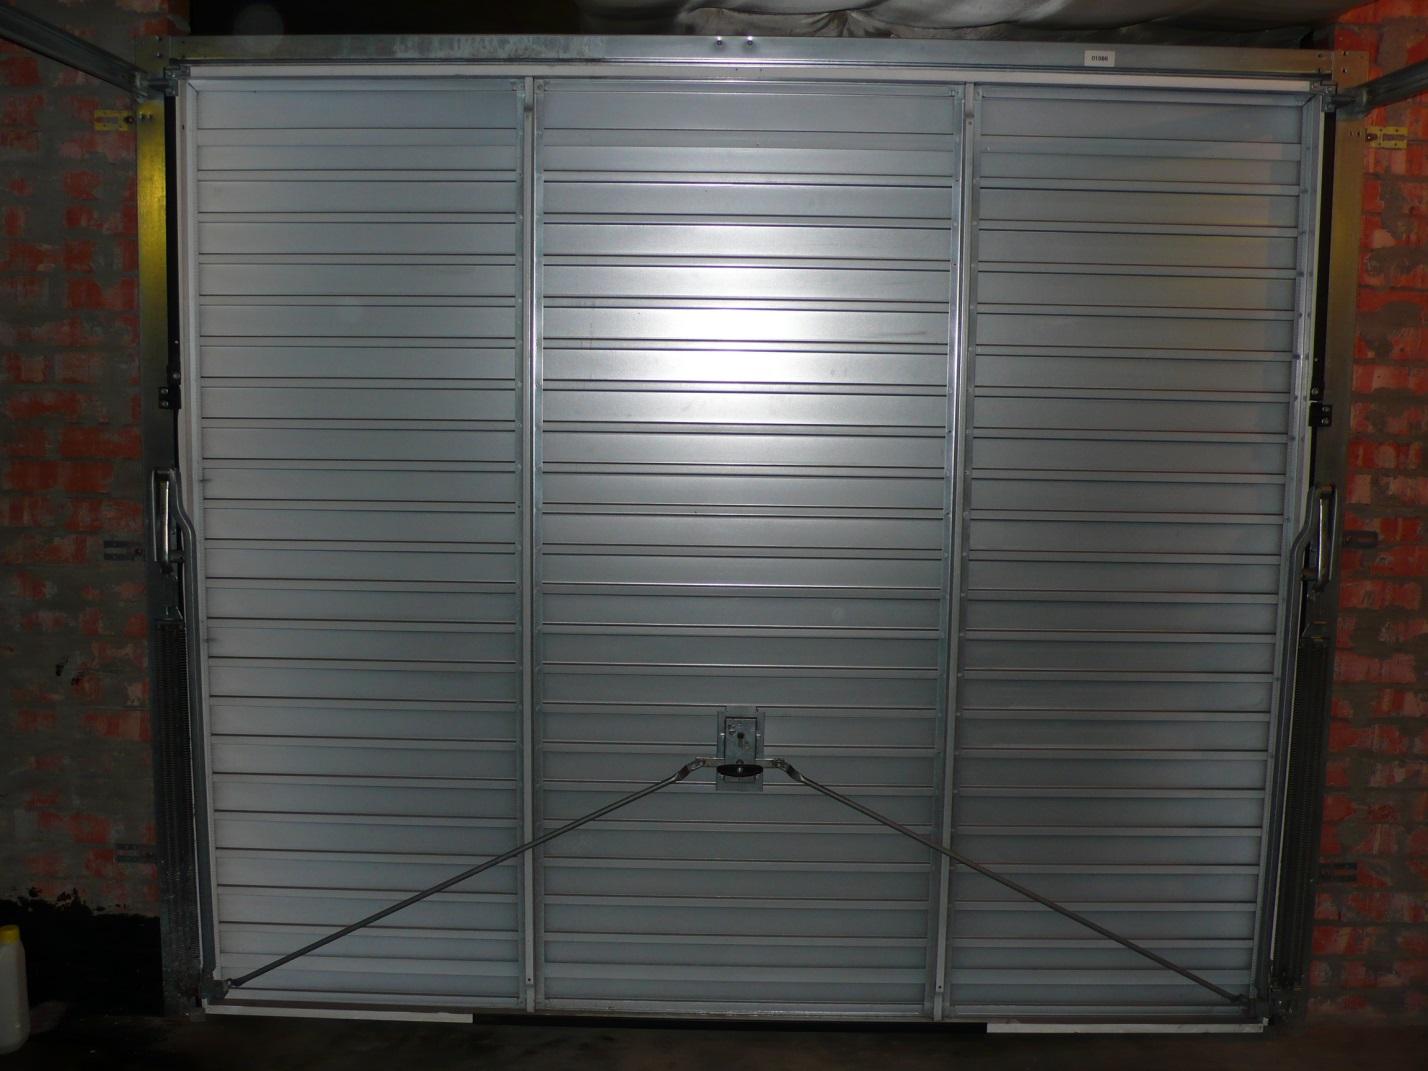 Ворота эконом-класса 2500х2500 для гаража Херманн